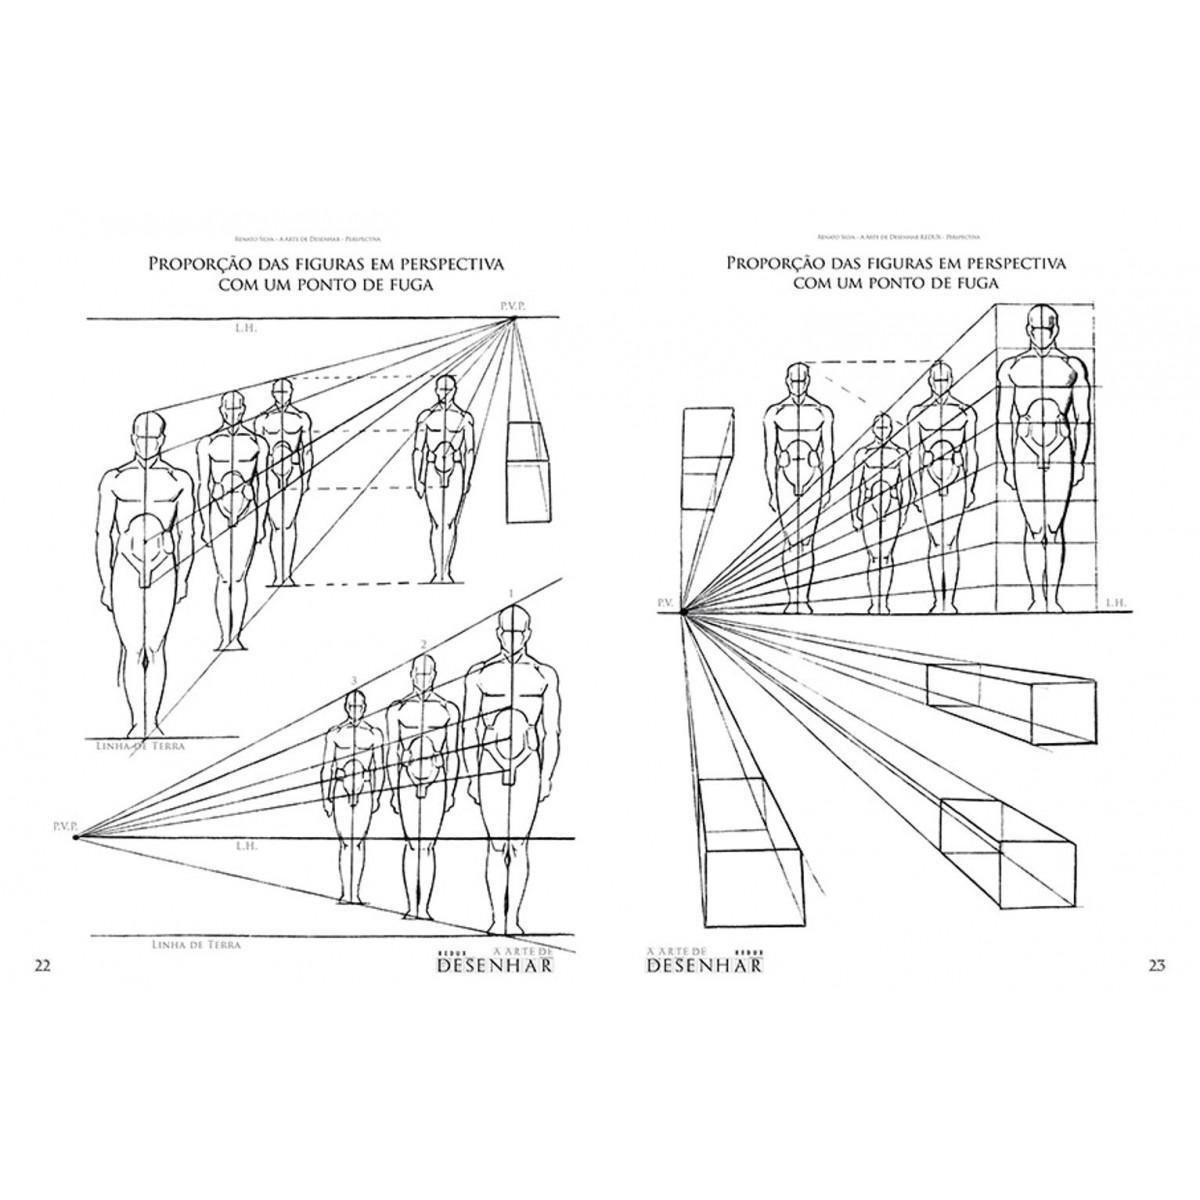 a-arte-de-desenhar-perspectiva-4.jpg